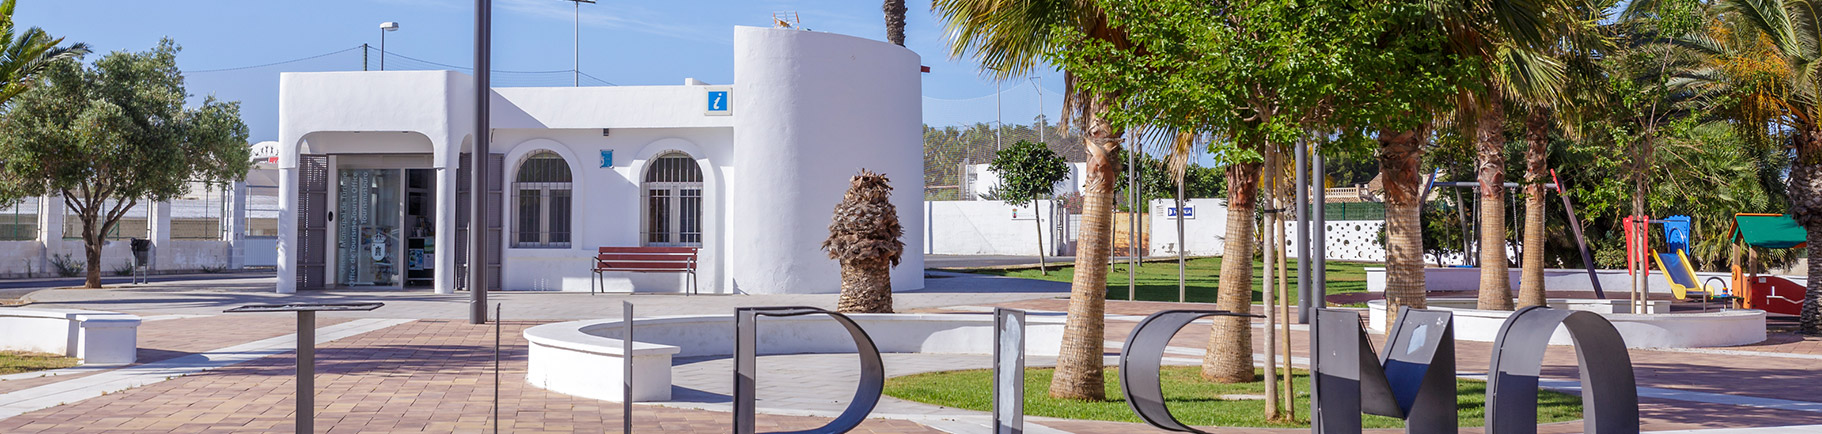 Oficinas de turismo turismo roquetas de mar for Oficina de turismo siguenza